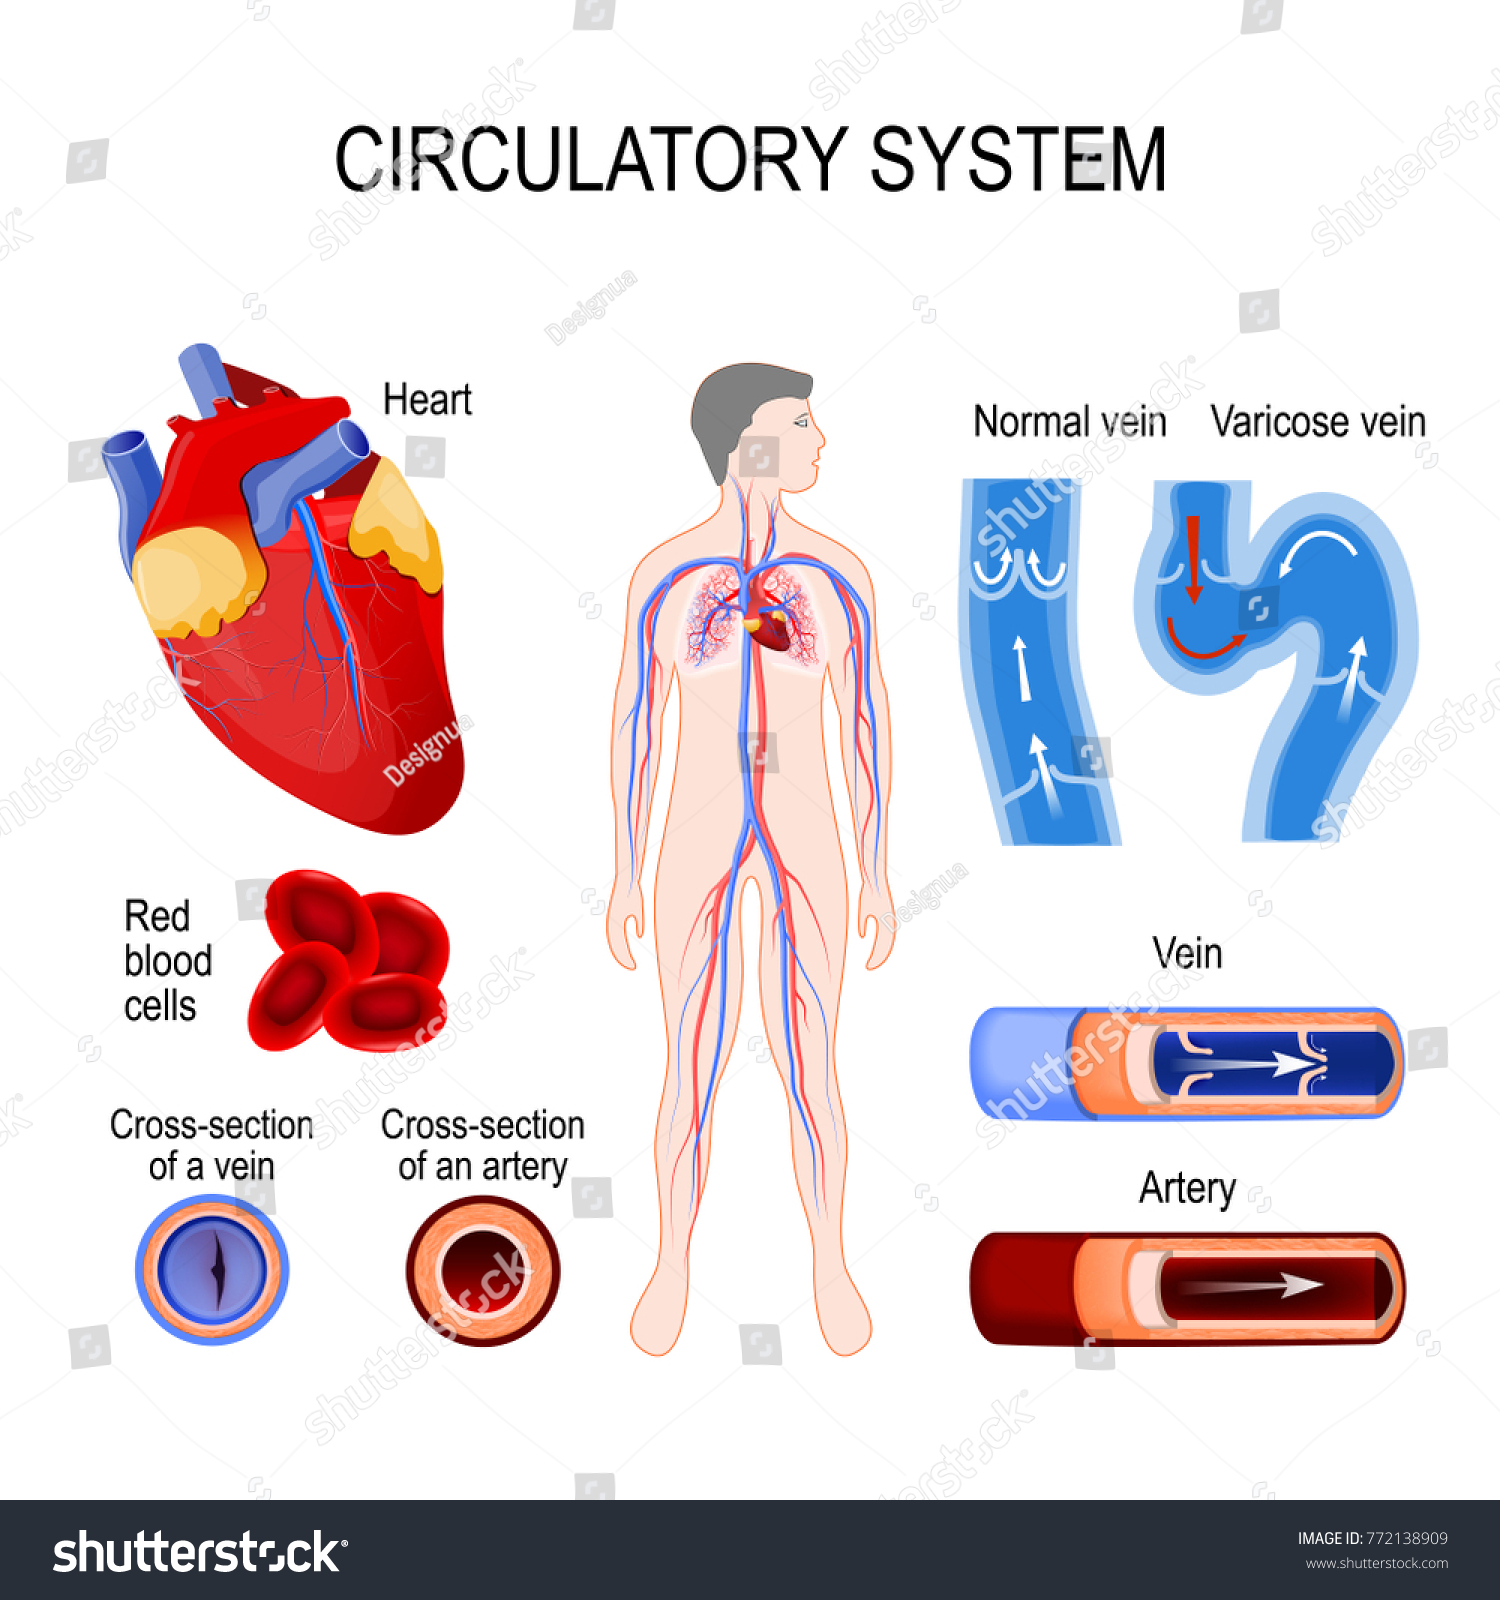 Circulatory System Heart Crosssection Artery Vein Stock Illustration